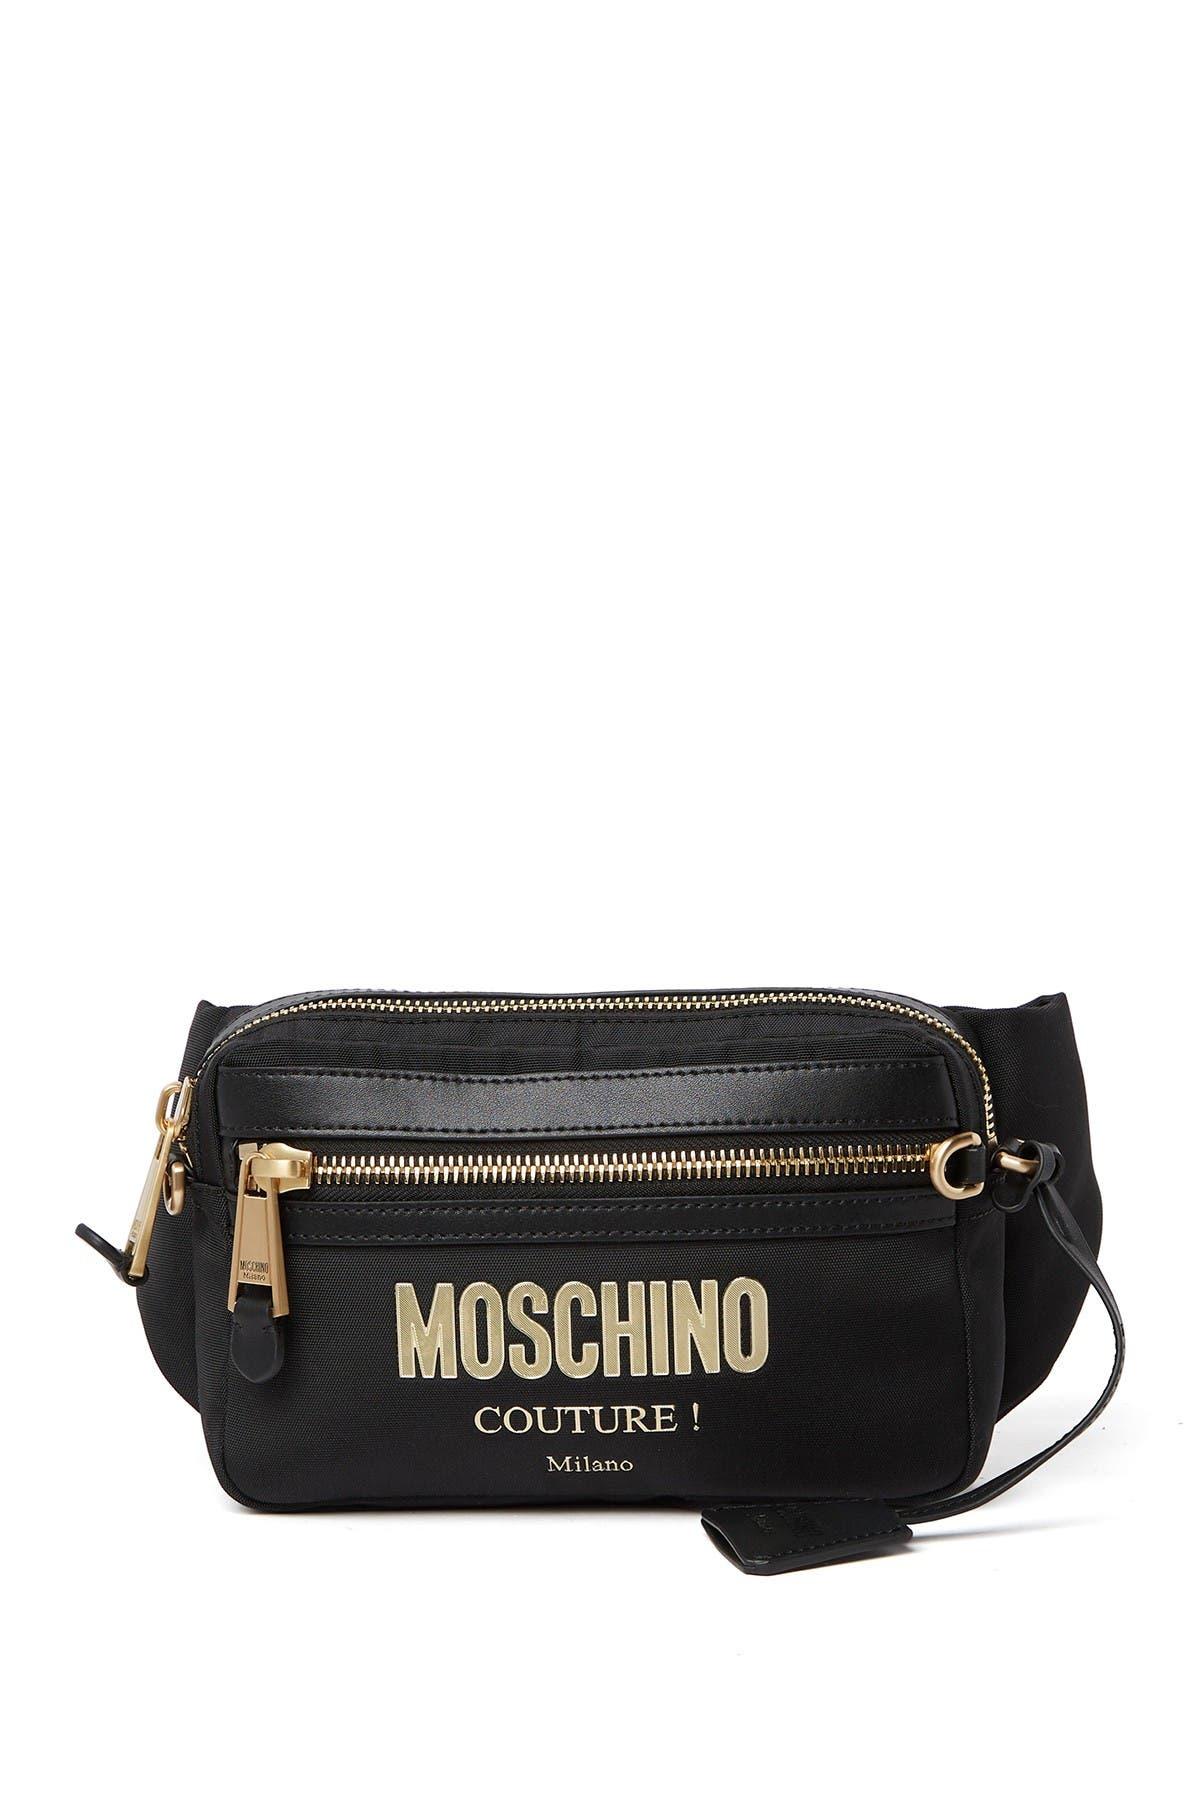 Image of MOSCHINO Logo Belt Bag